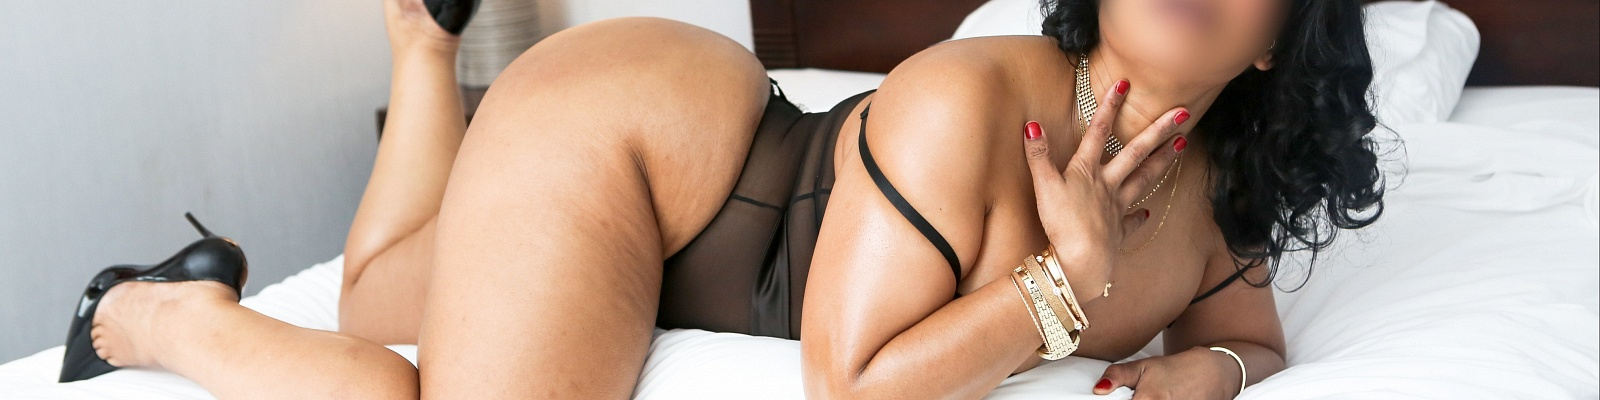 Miss Talia Tayer's Cover Photo